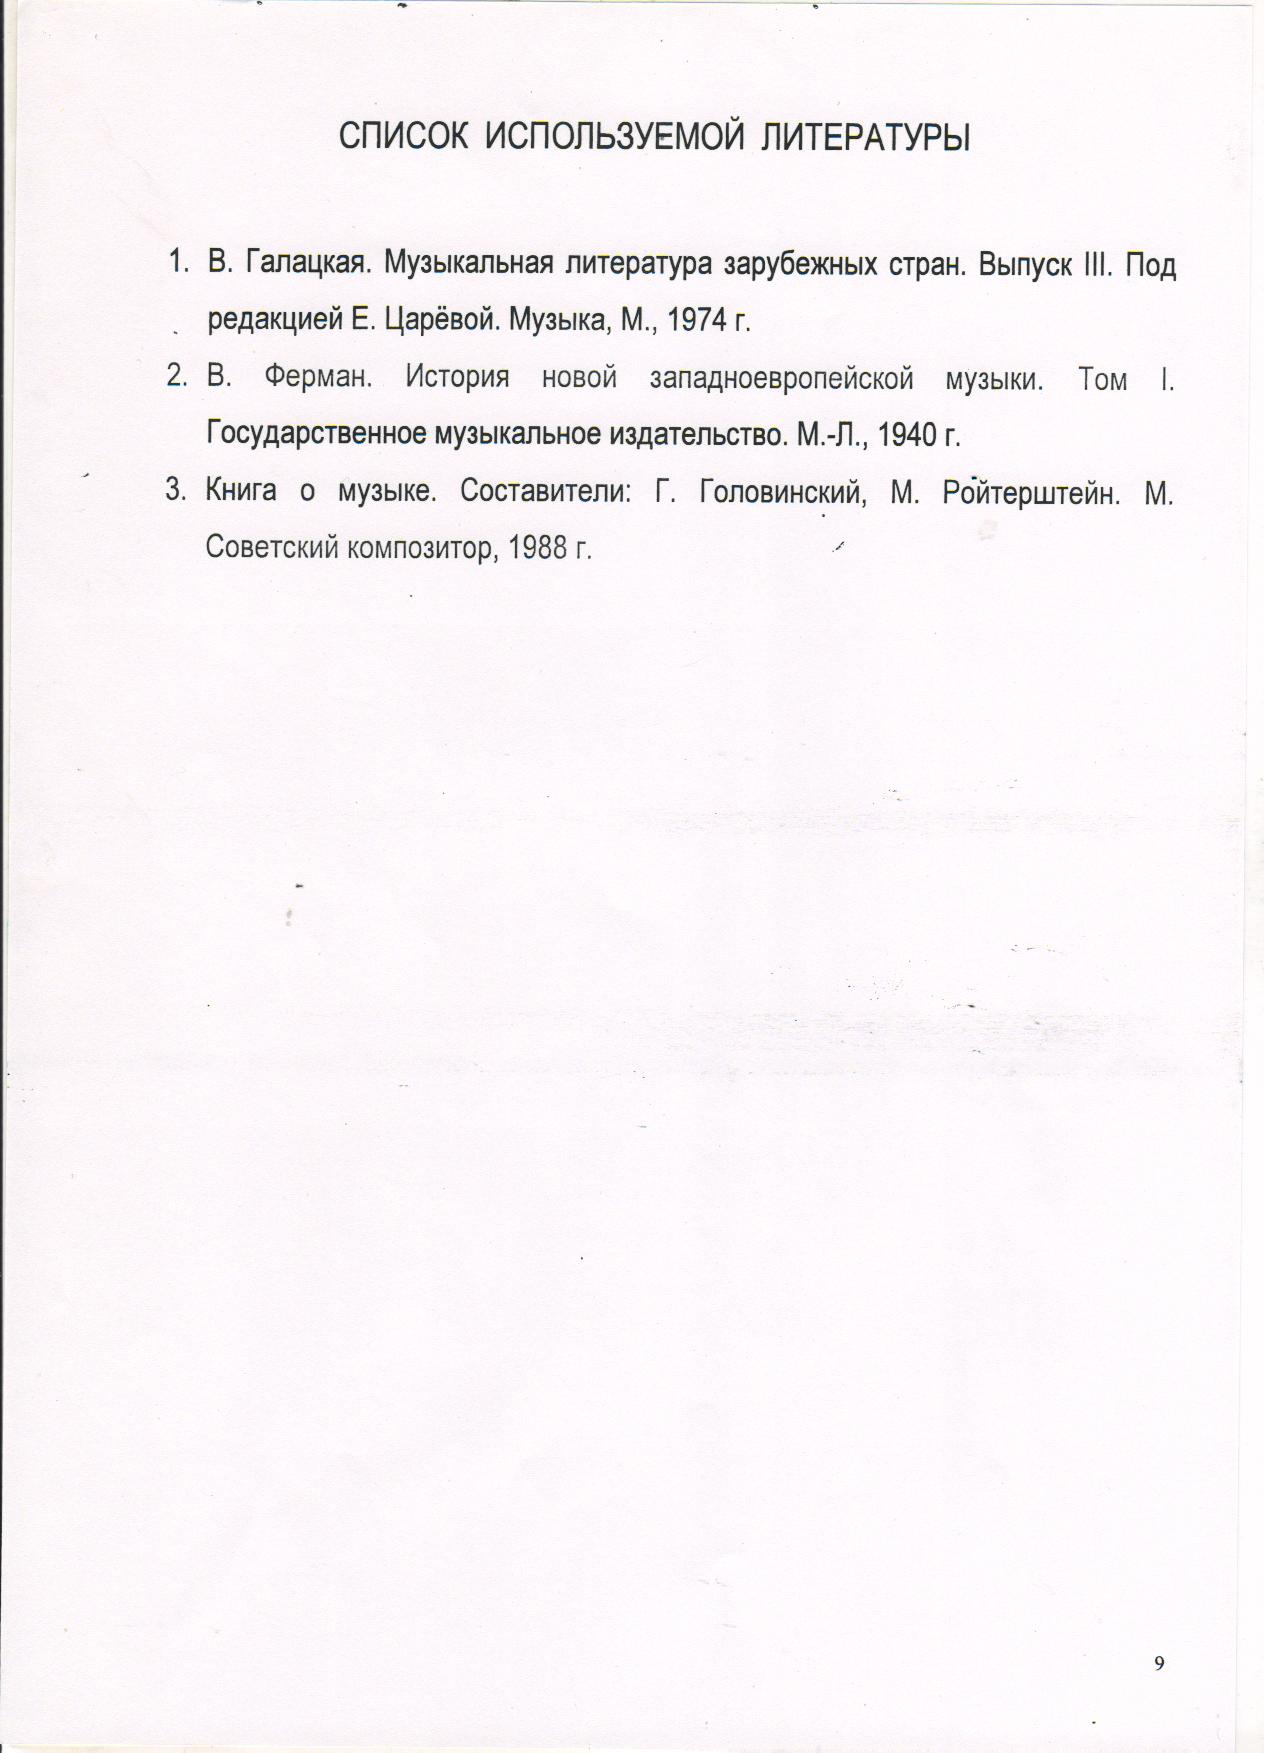 C:\Documents and Settings\Учитель\Рабочий стол\Шуман 9.jpg